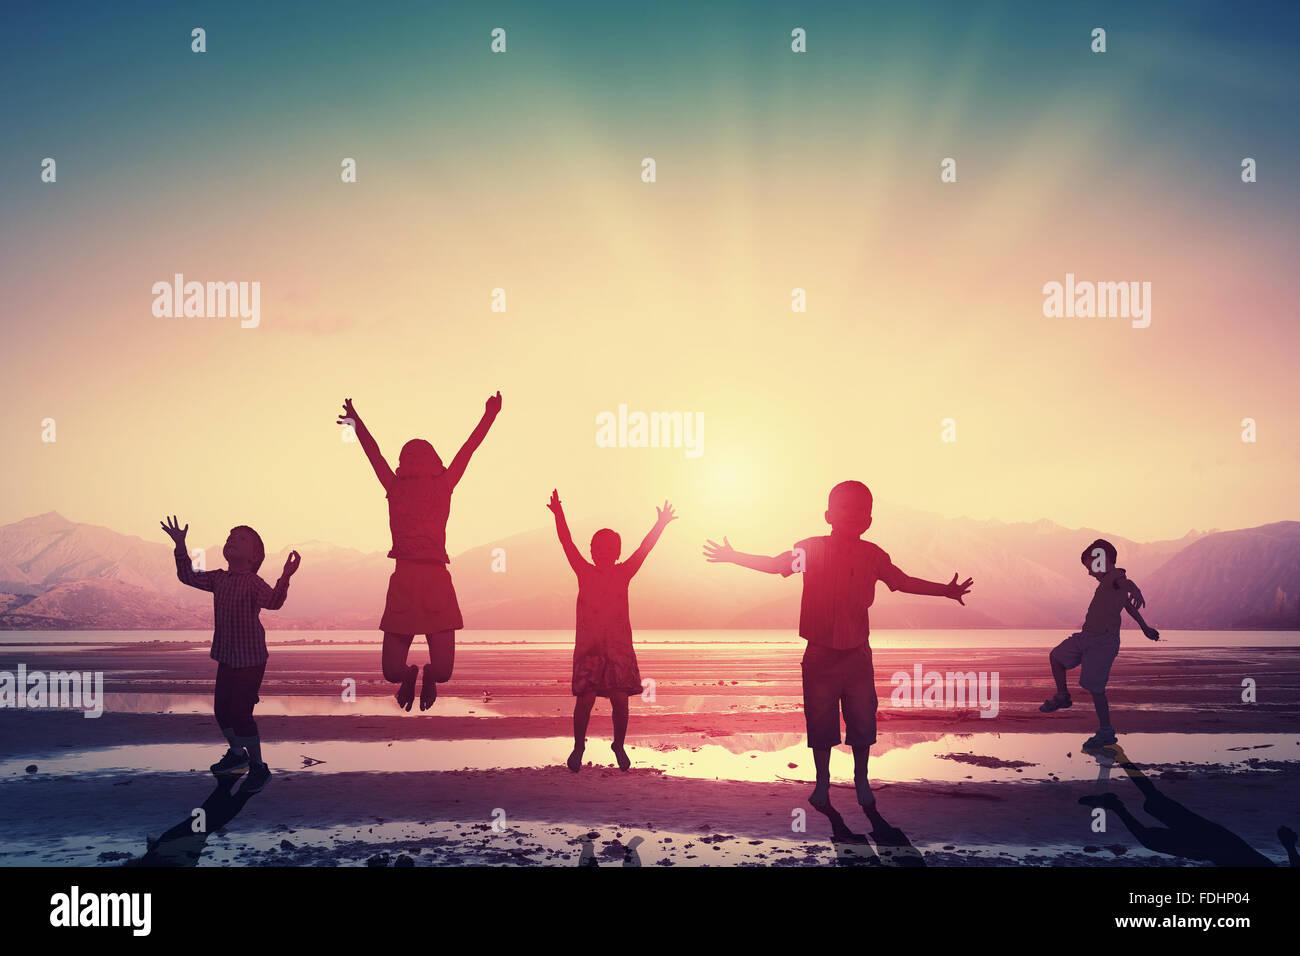 Las siluetas del grupo de niños saltando alto gozosamente en sunset antecedentes Imagen De Stock